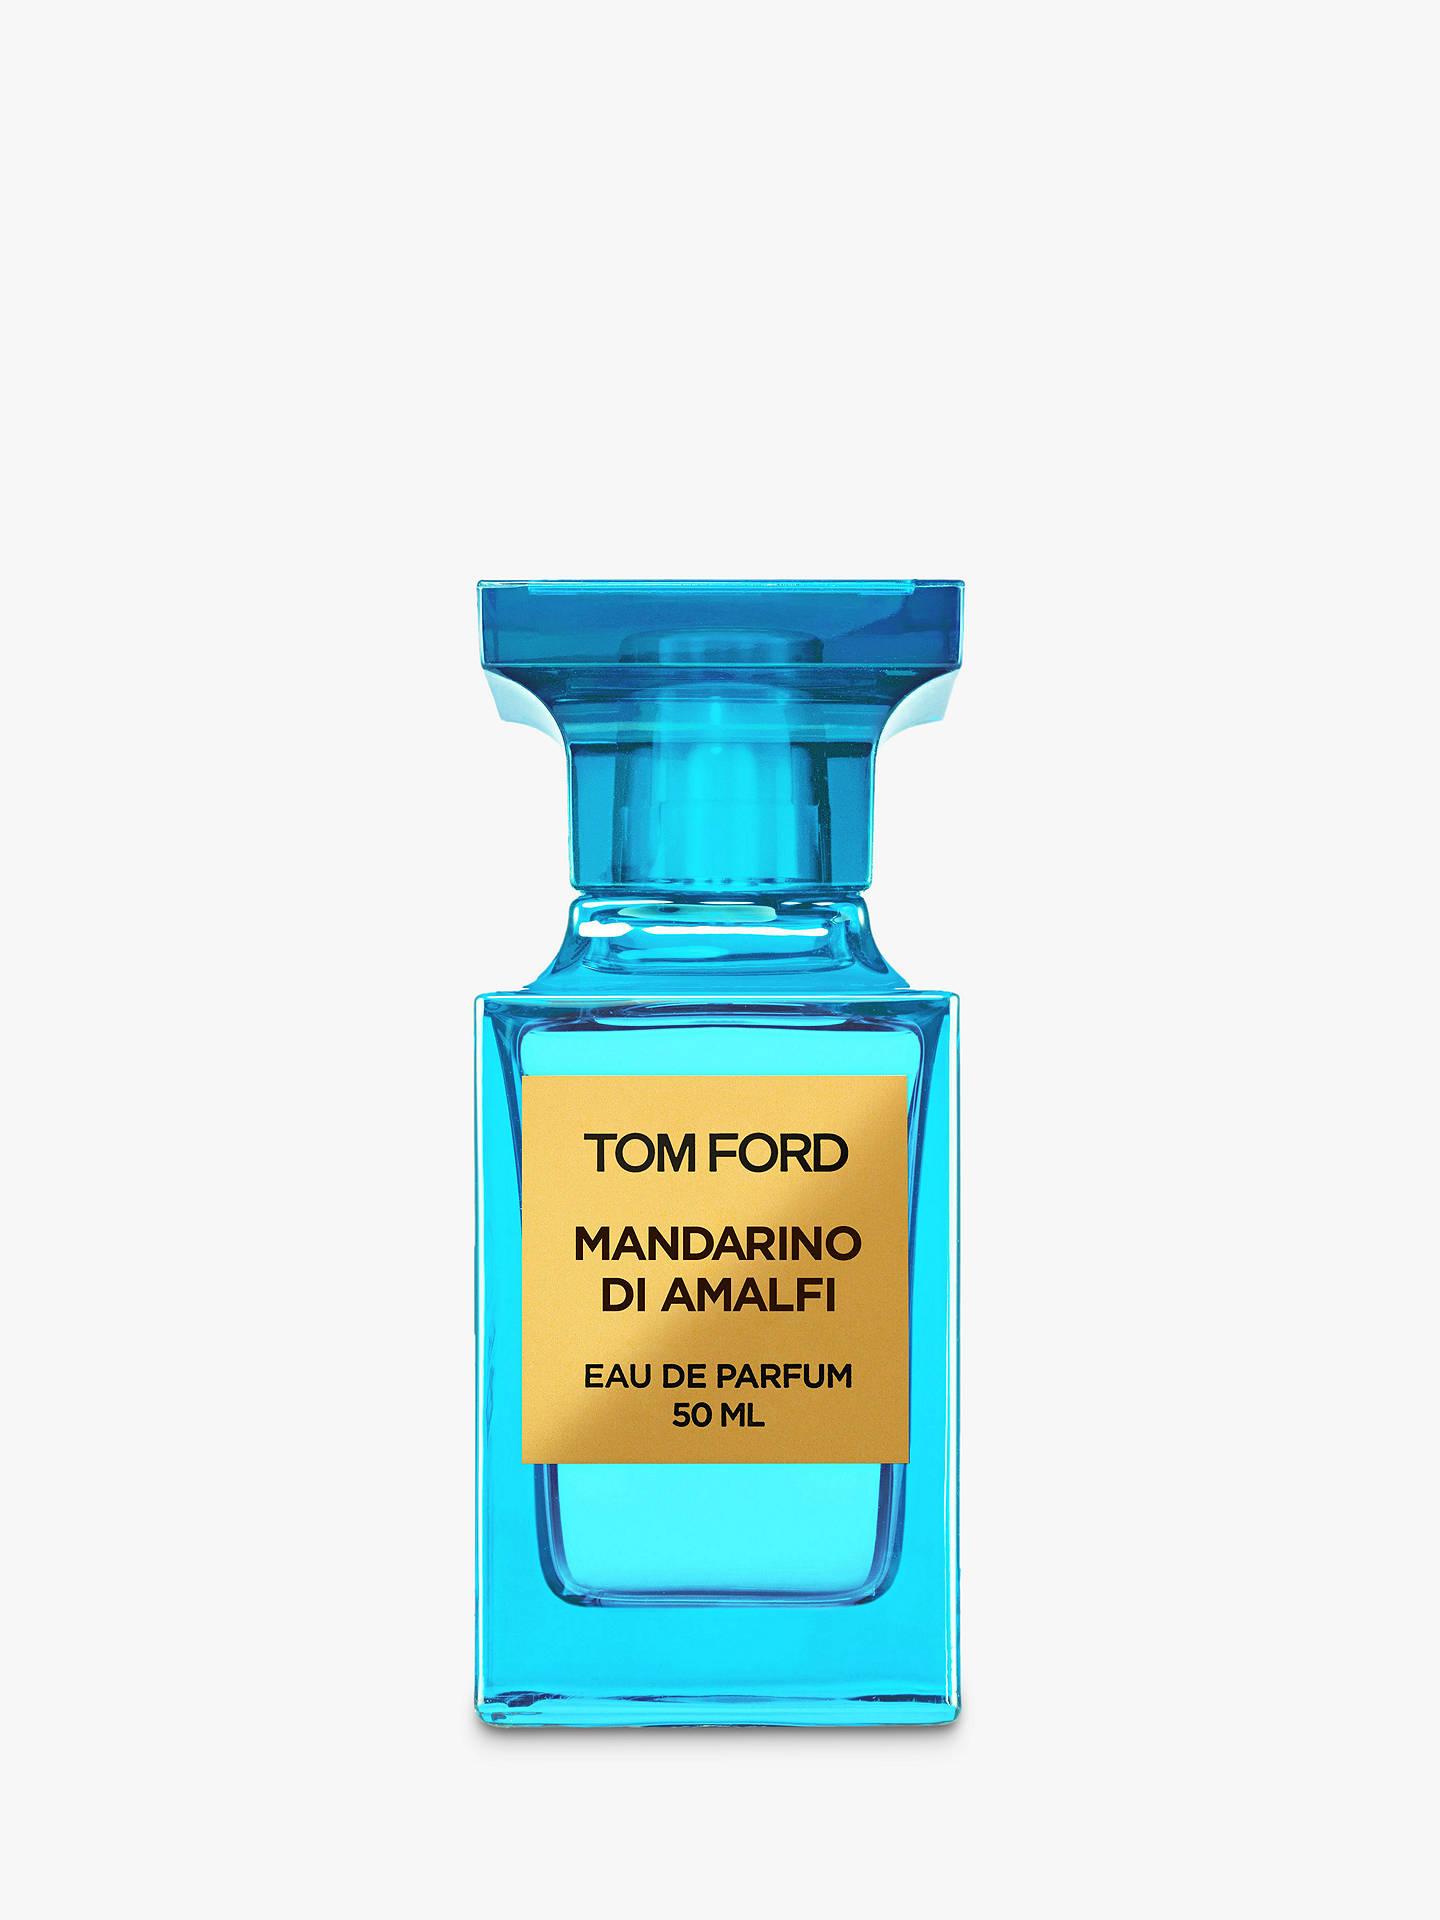 77cc9b8ca596 Buy TOM FORD Private Blend Mandarino Di Amalfi Eau de Parfum